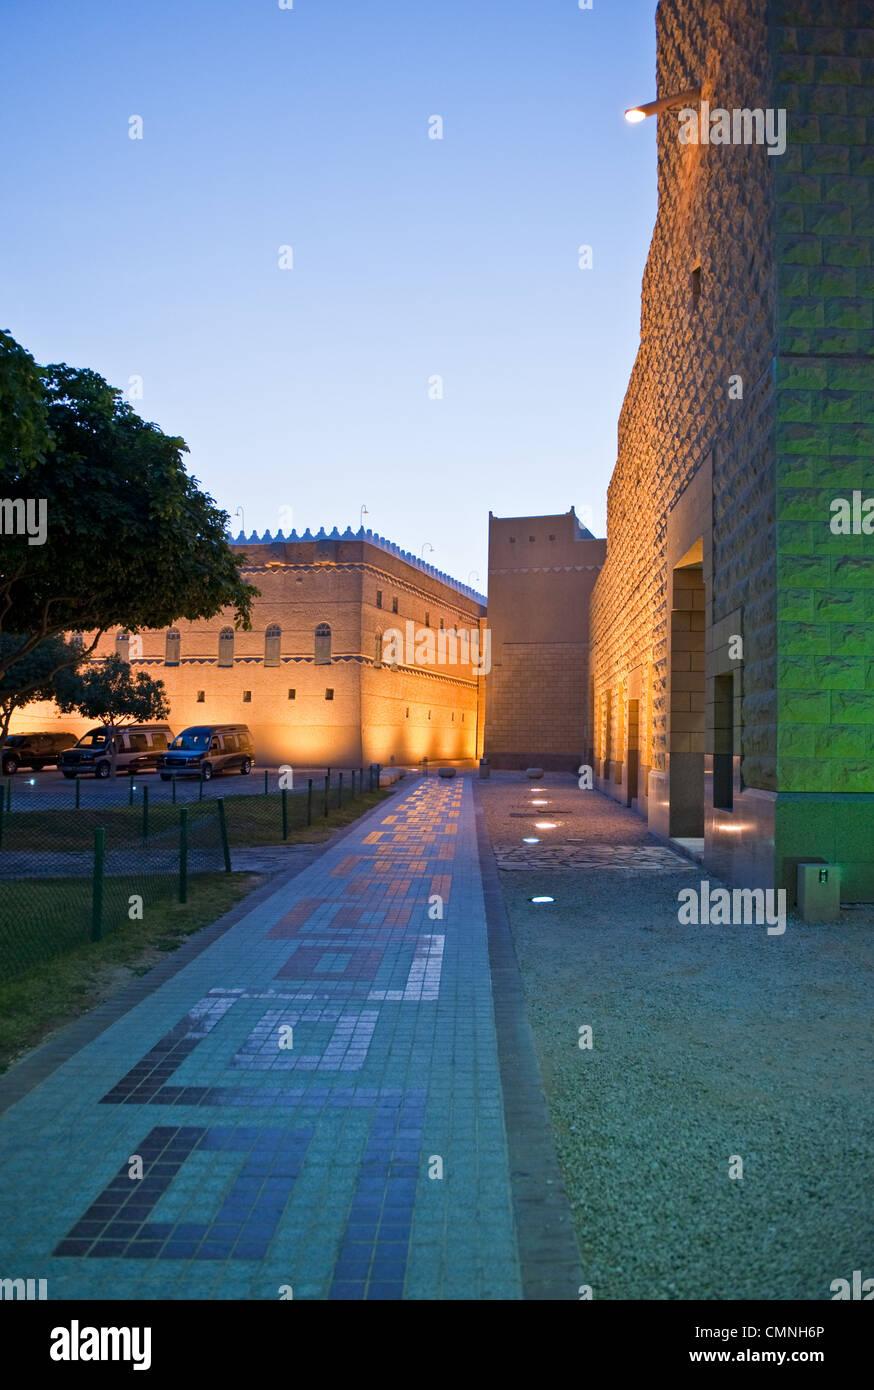 Asie Arabie Saoudite Riyadh Palace) Photo Stock